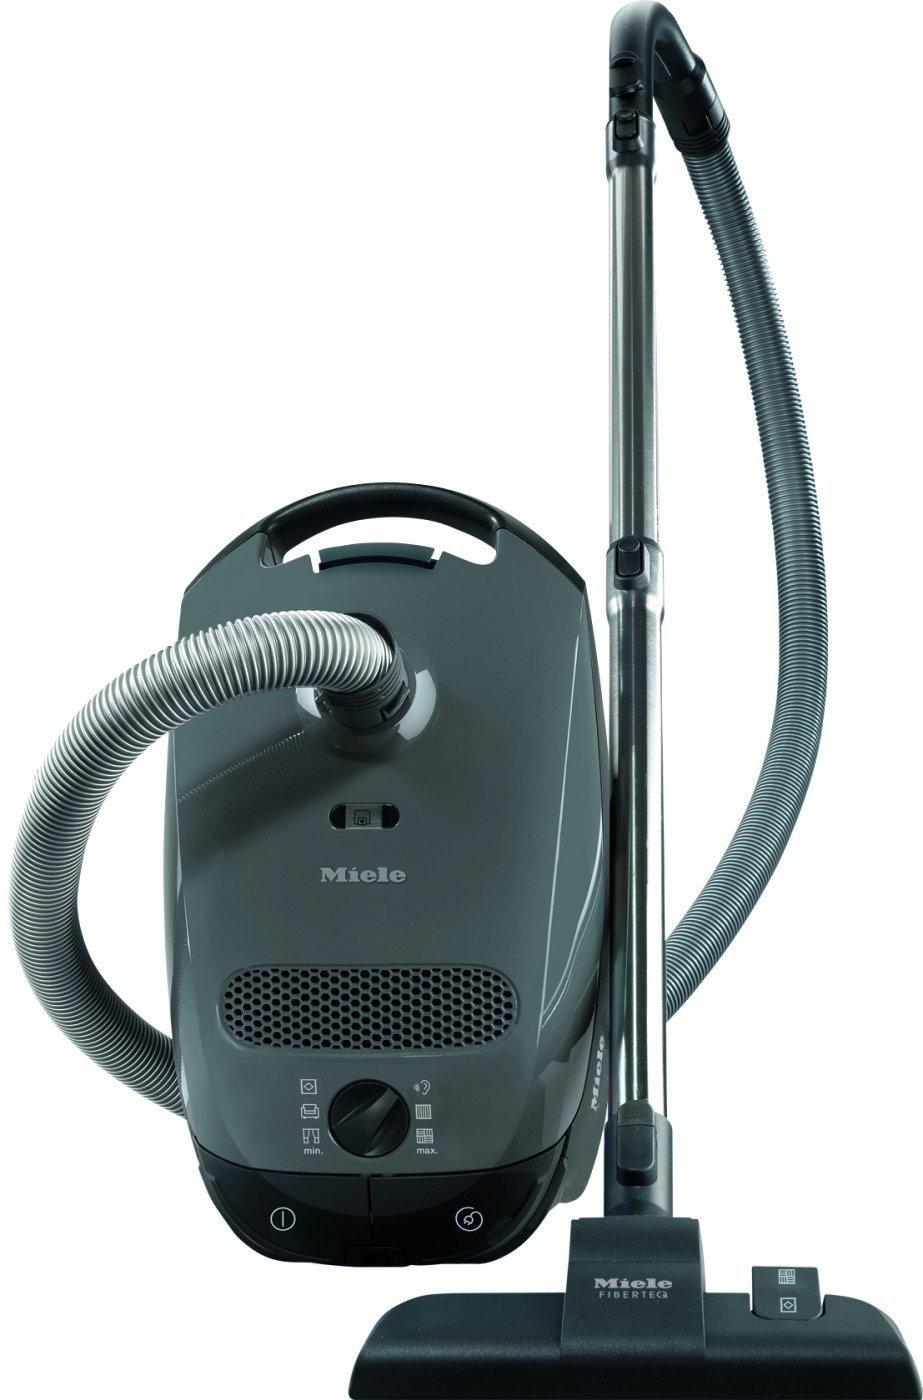 Miele Classic C1 Edition Powerline, Graphite Grey £99.99 @ Amazon